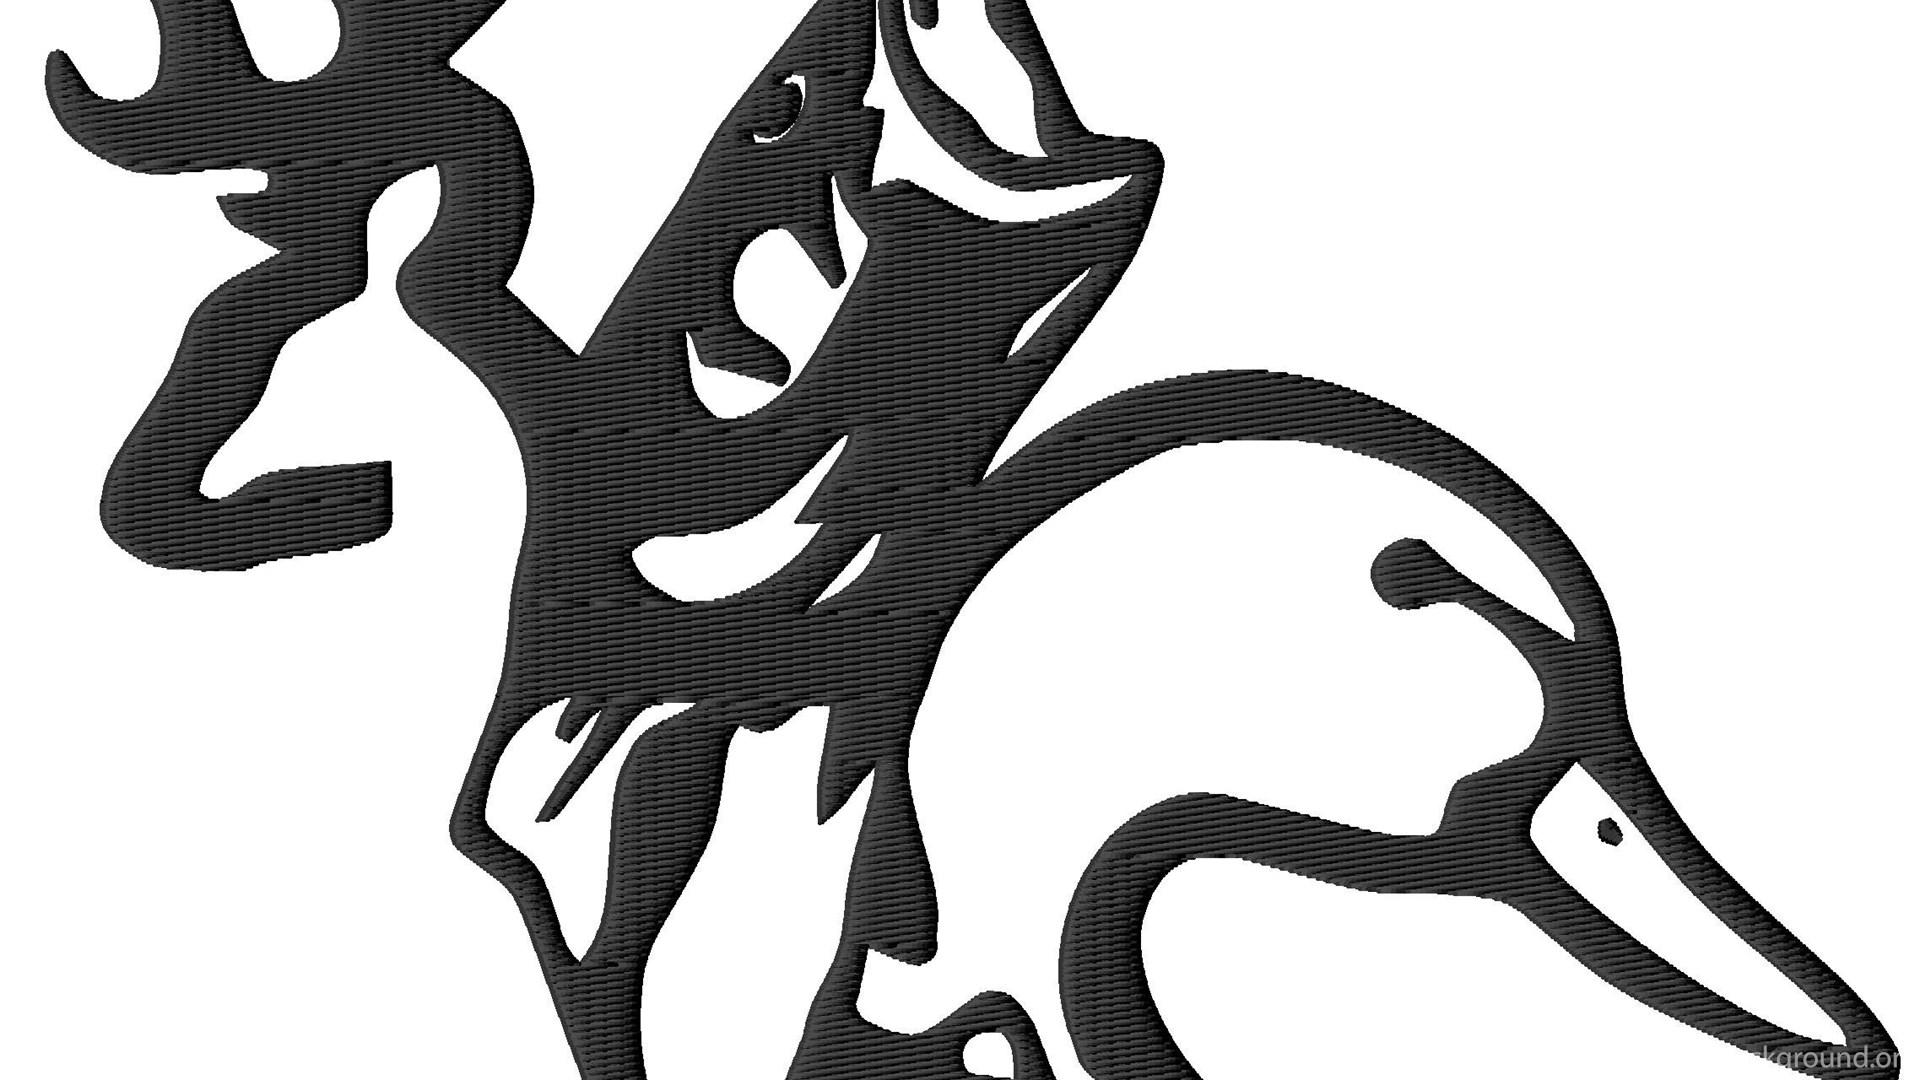 Browning Symbol Wallpapers Wallpapers Zone Desktop Background